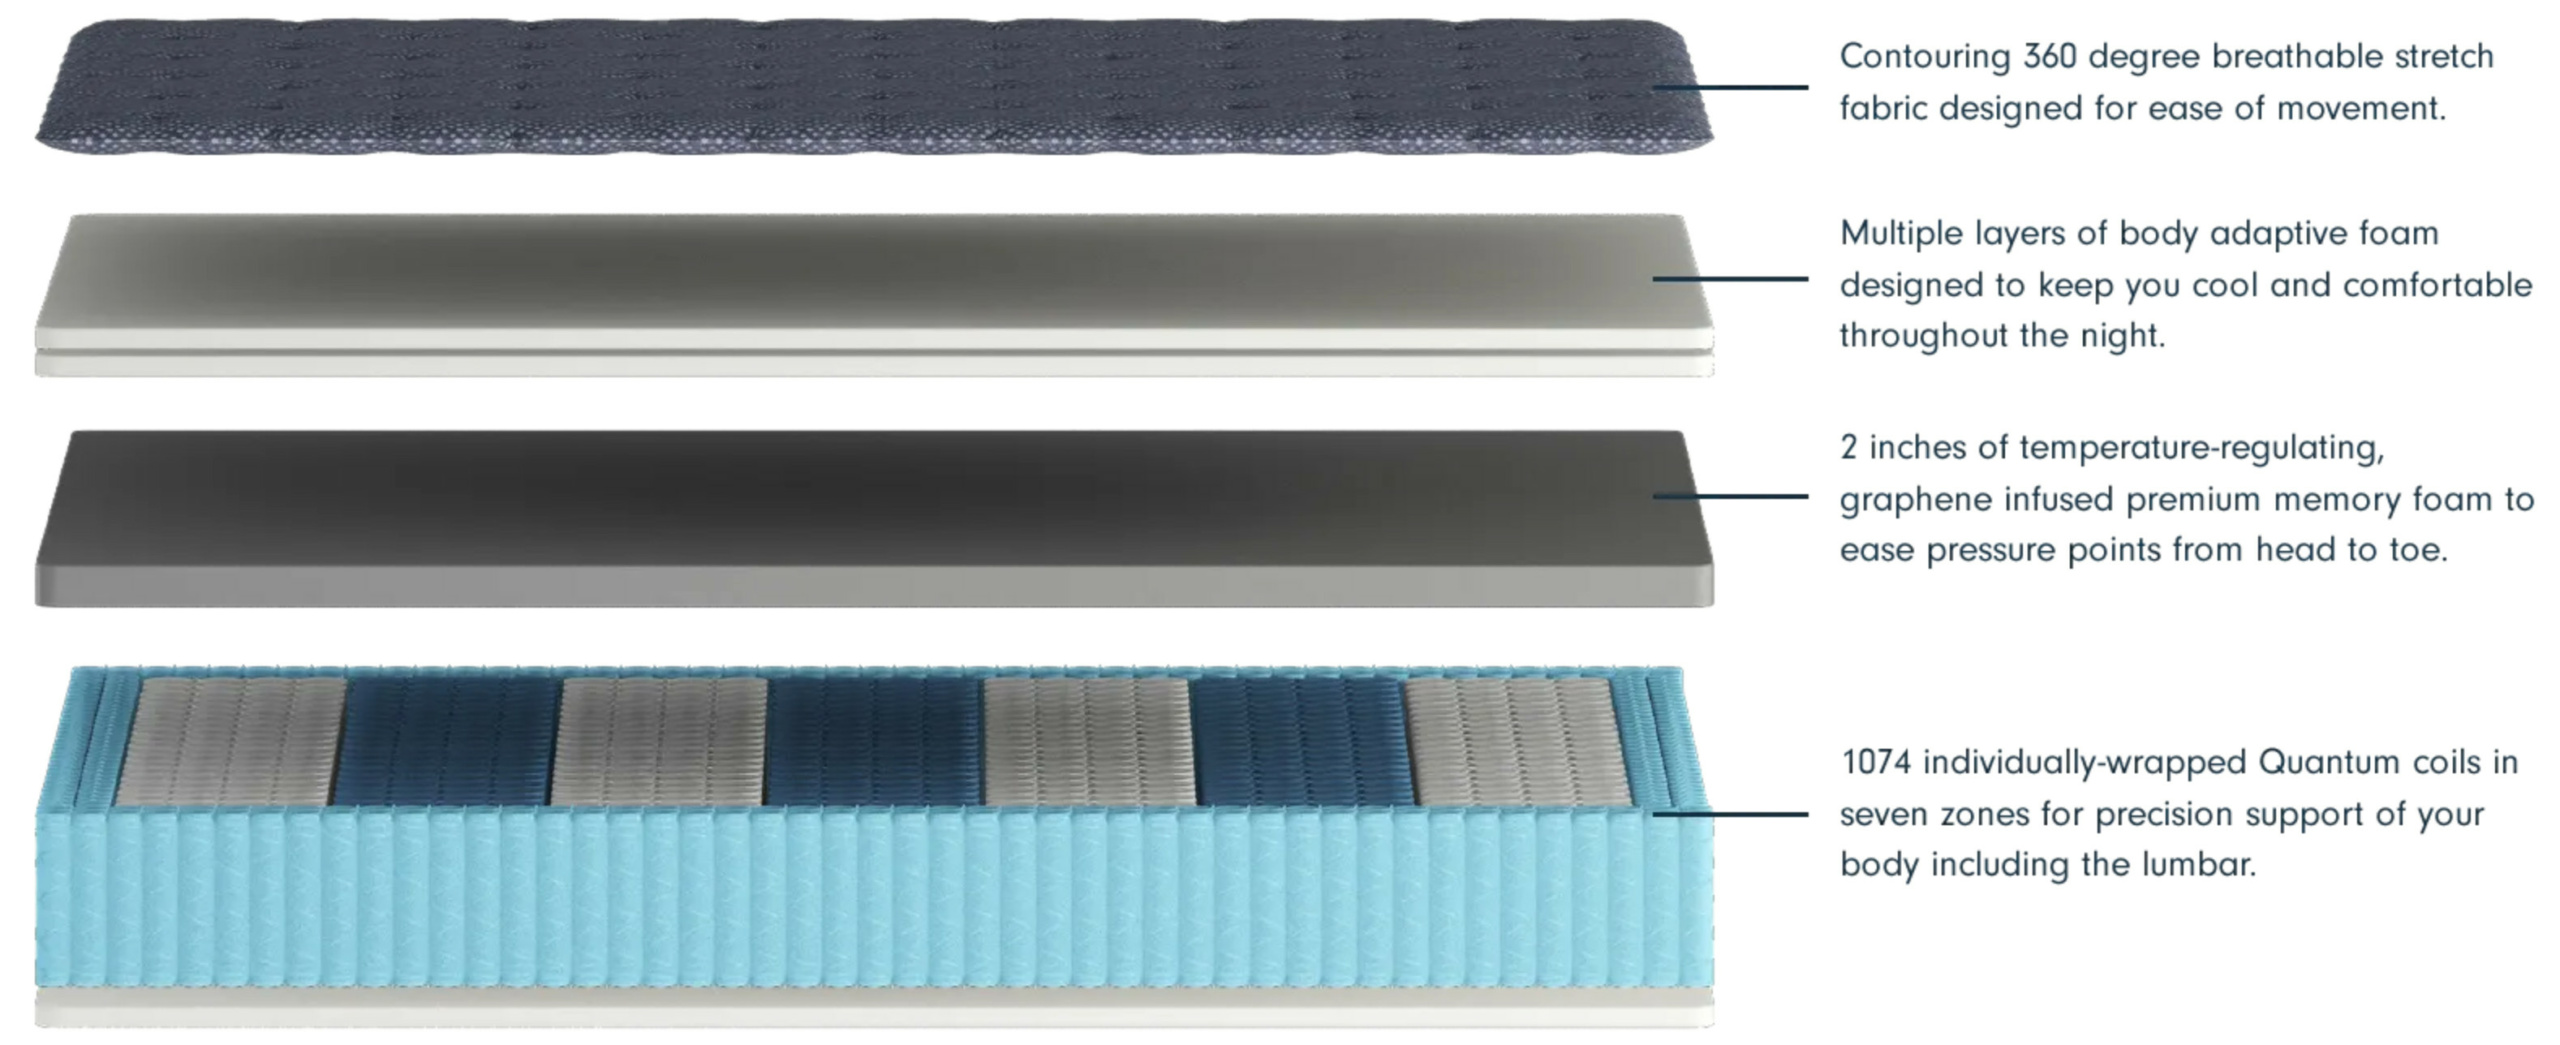 luuf firm materials